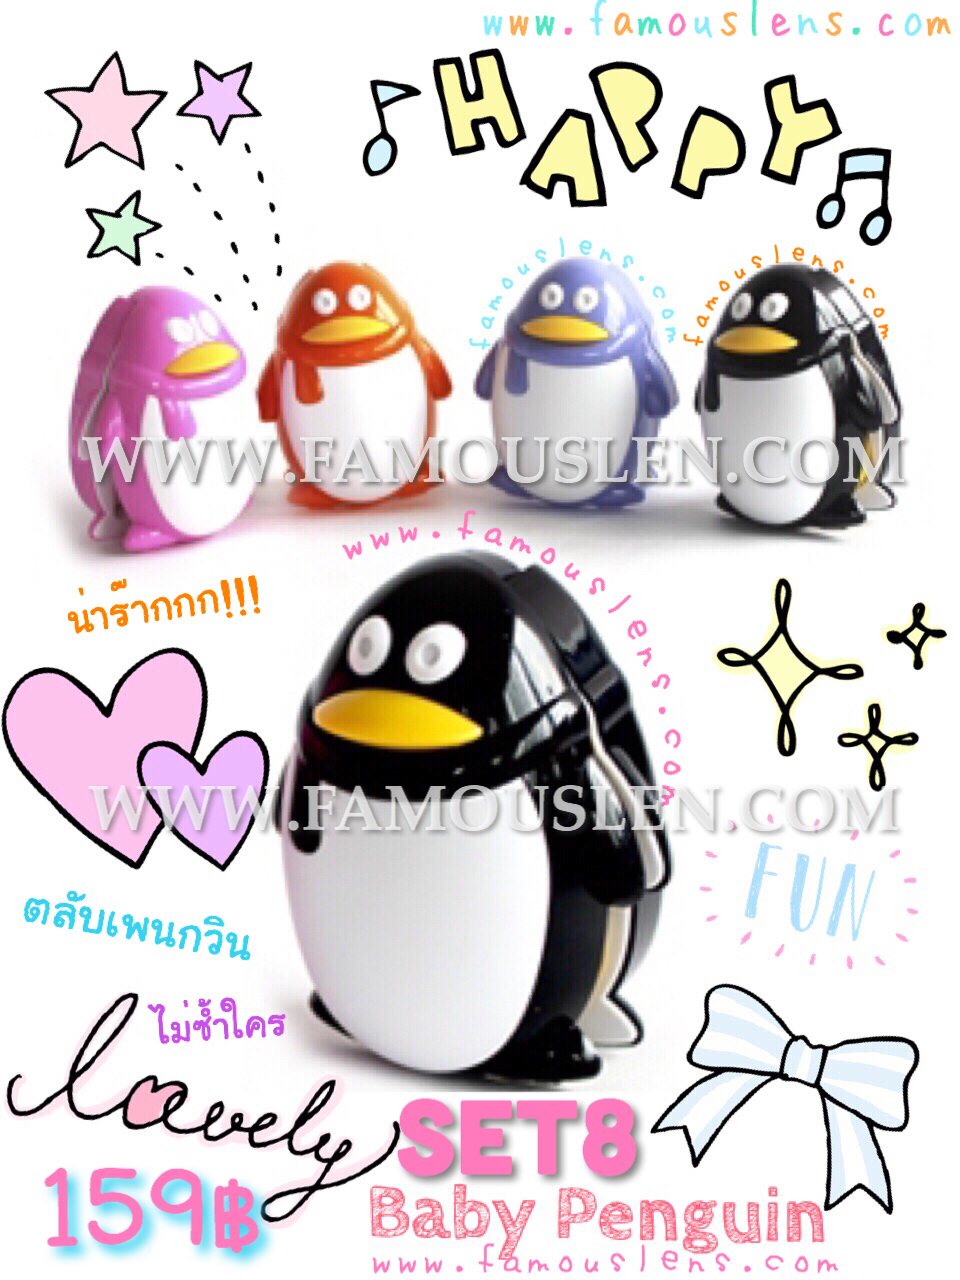 Penguin contact lens case famouslens.com ตลับเพนกวิน